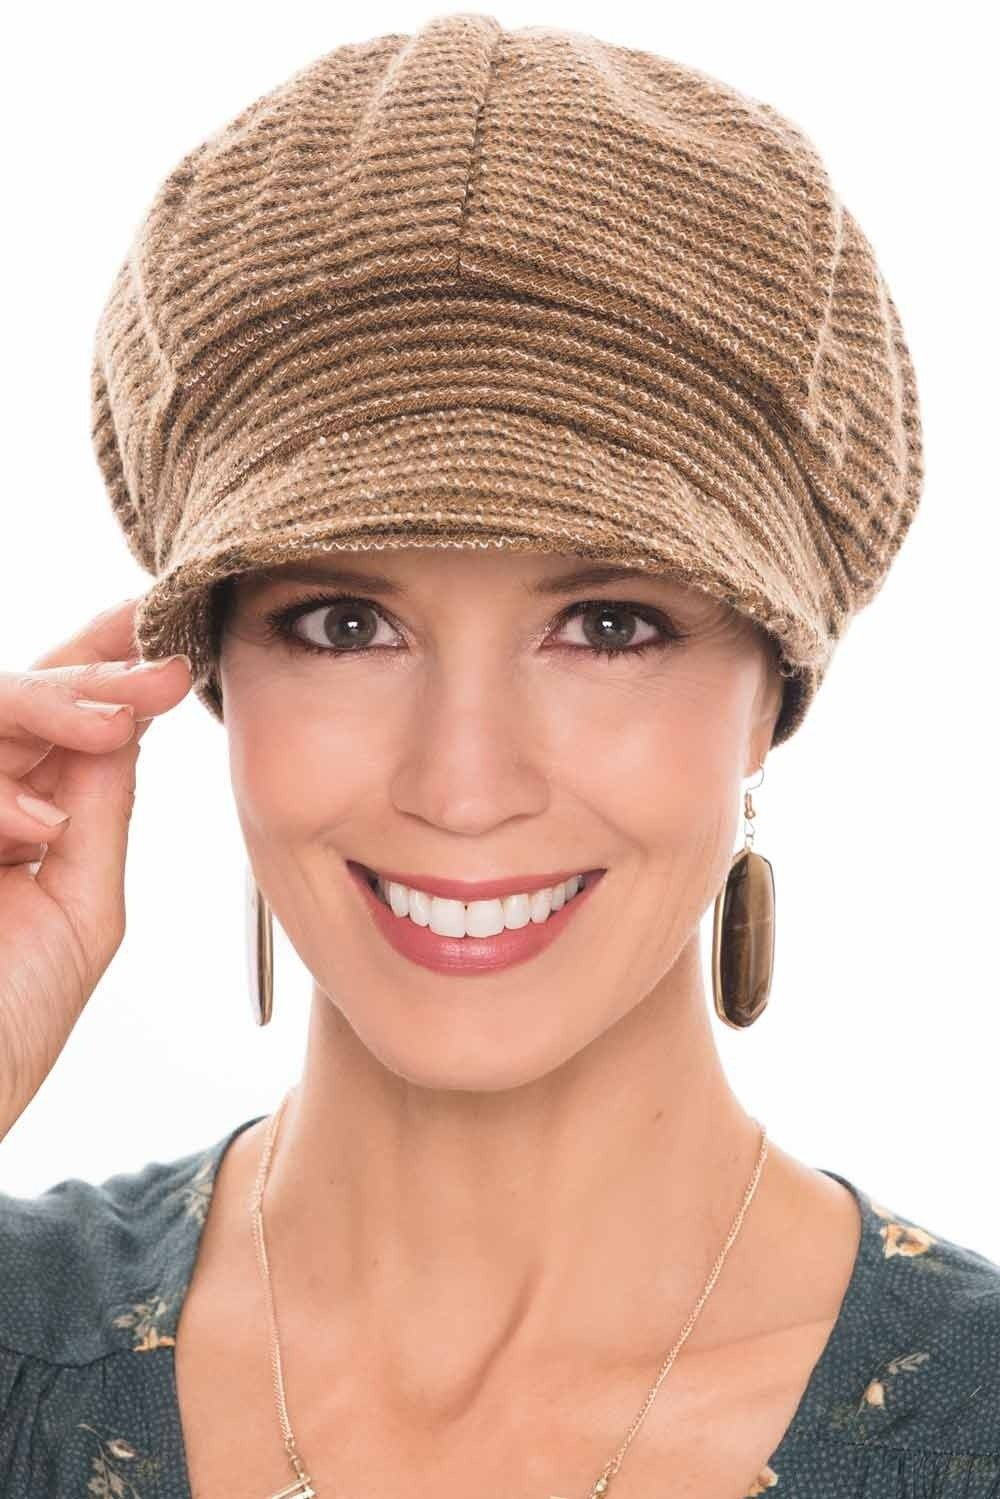 77f58833 Tweed Talia Newsboy Hat   Fall & Winter Cap for Women   cancer ...